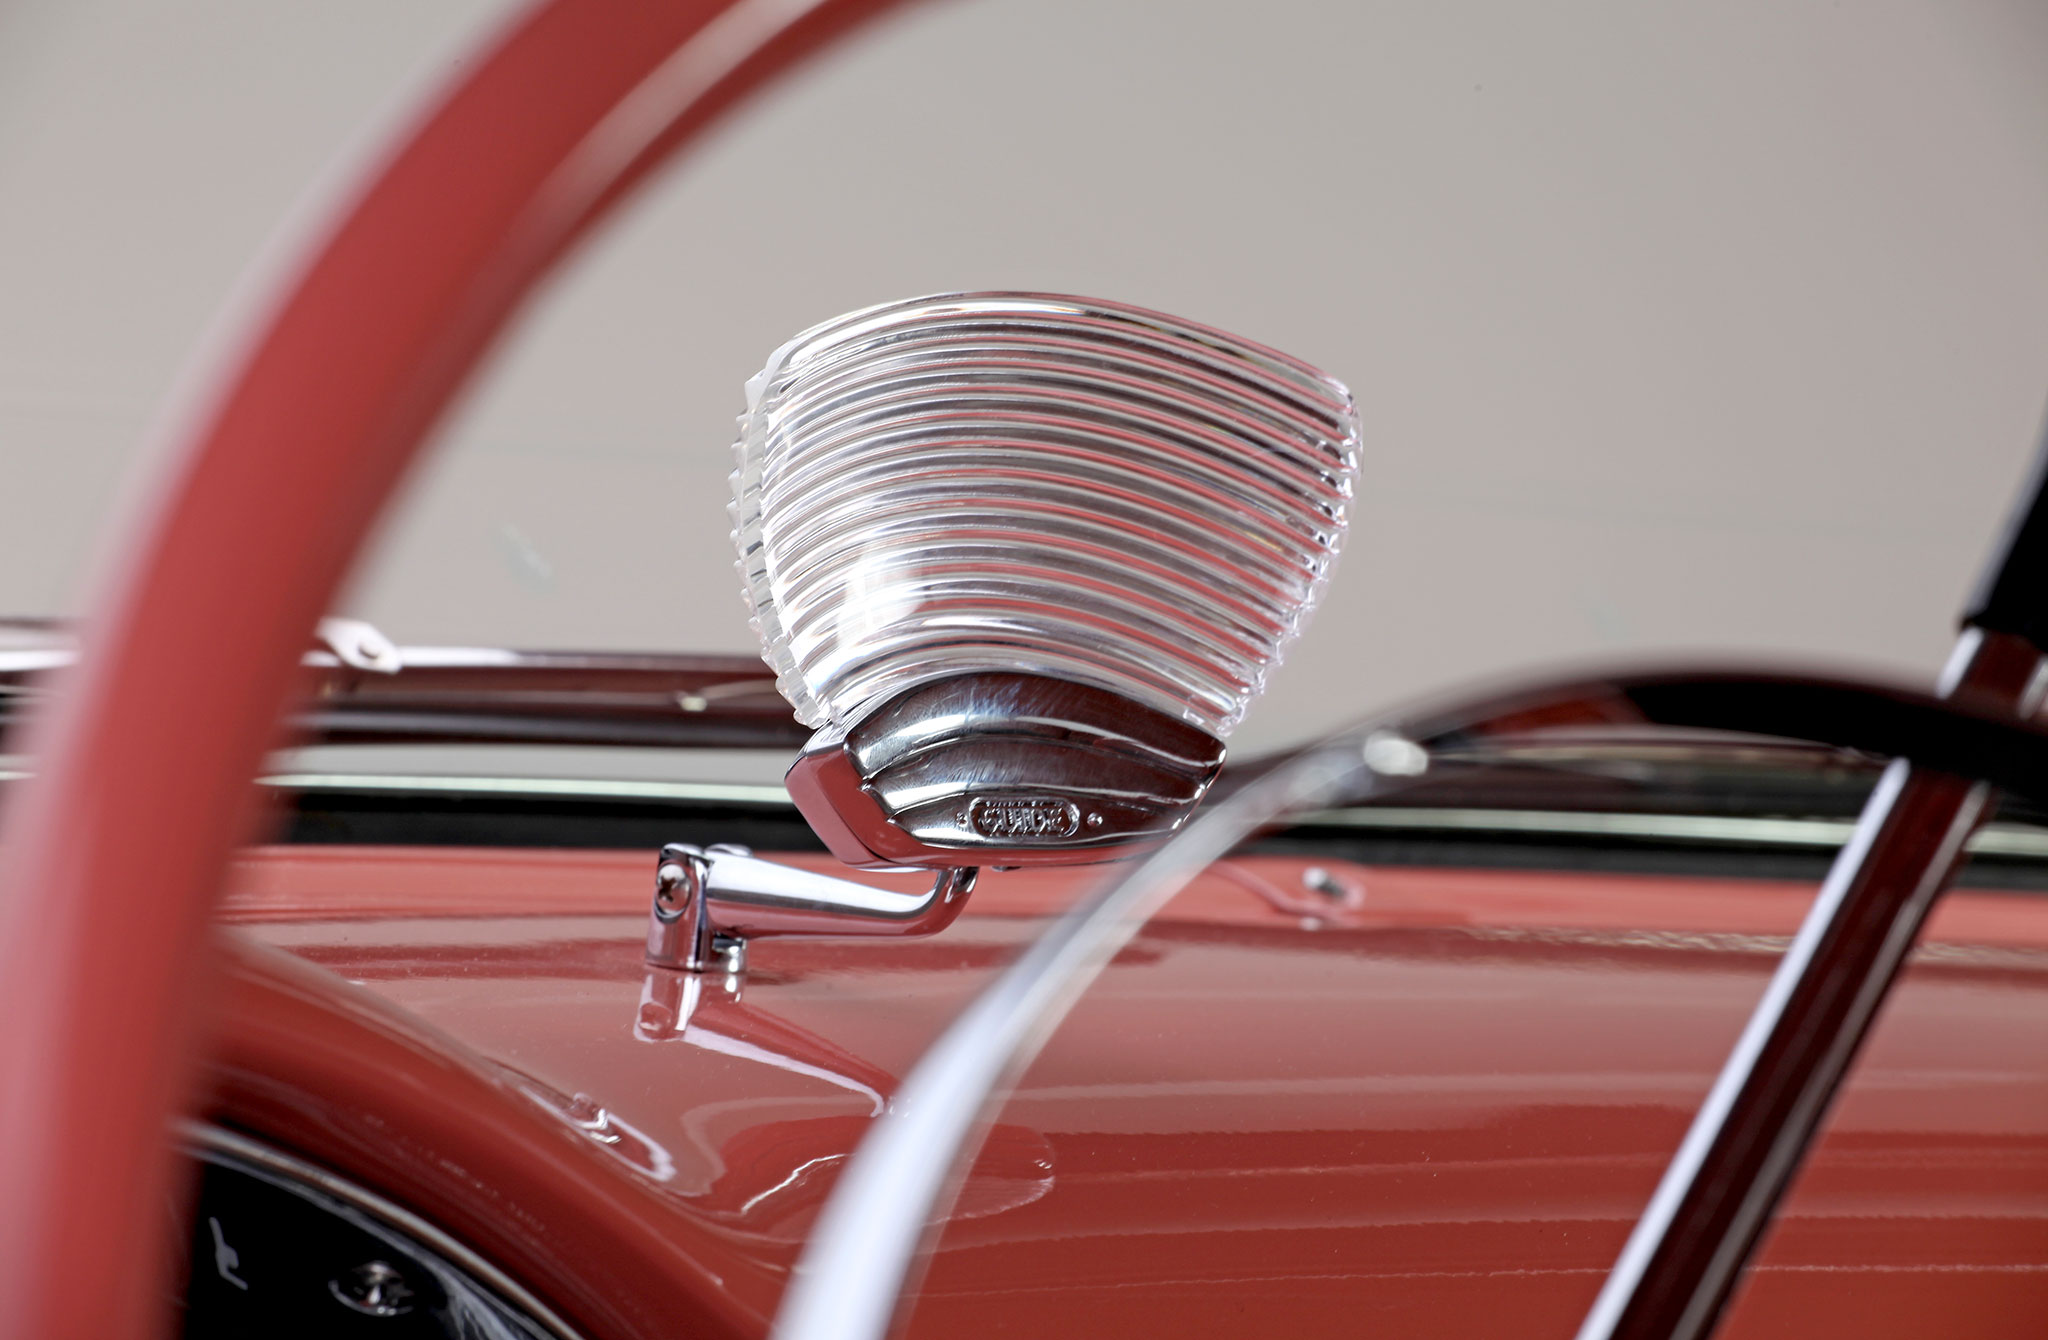 1955 Chevrolet Bel Air - The King Of Bel Air